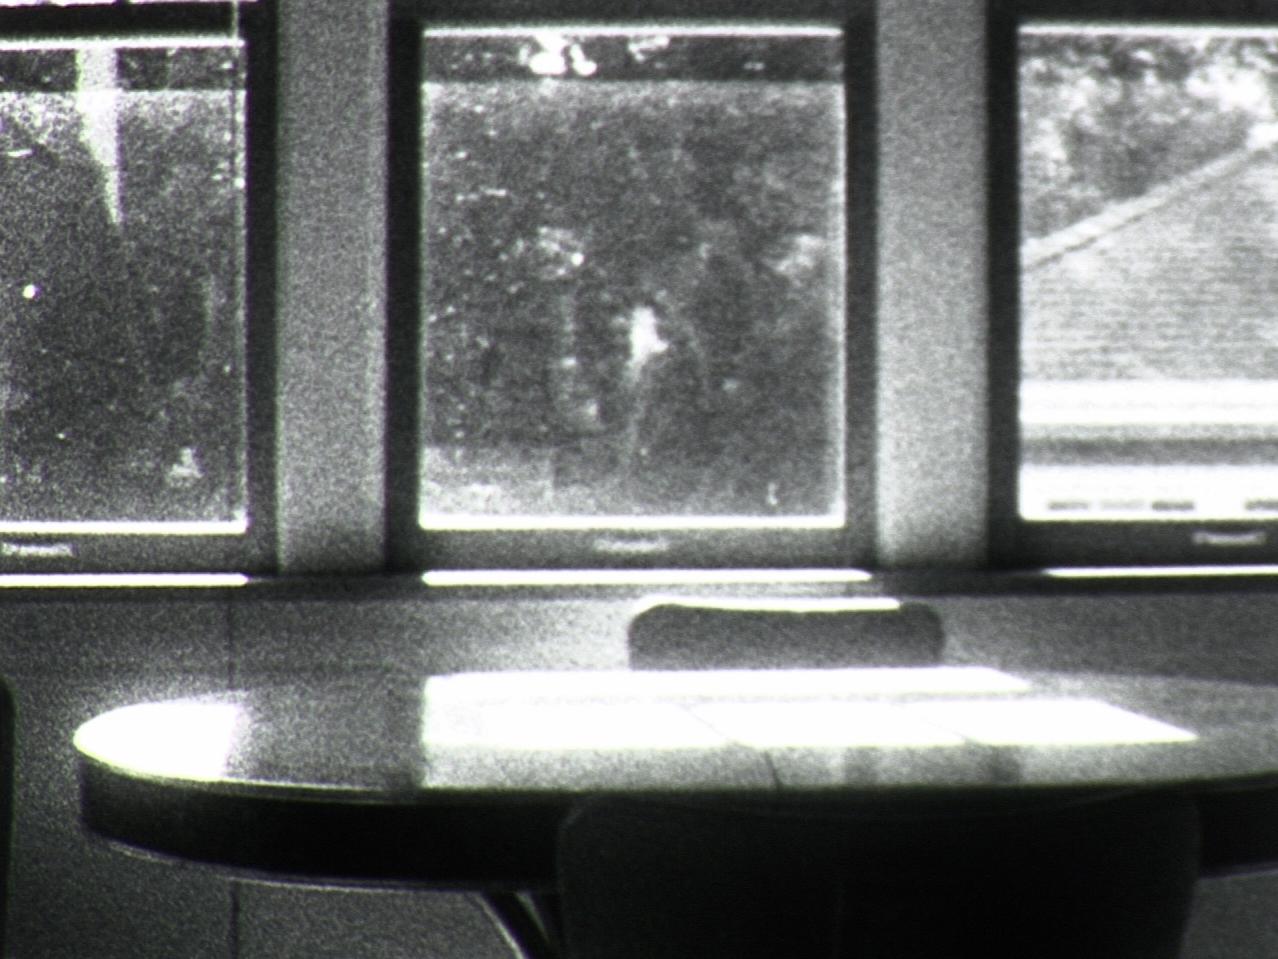 Findings     Kioto Aoki   2017  3 minutes  USA  16mm  b&w   silent  world premiere  A navigation of space via bodies of light. -KA